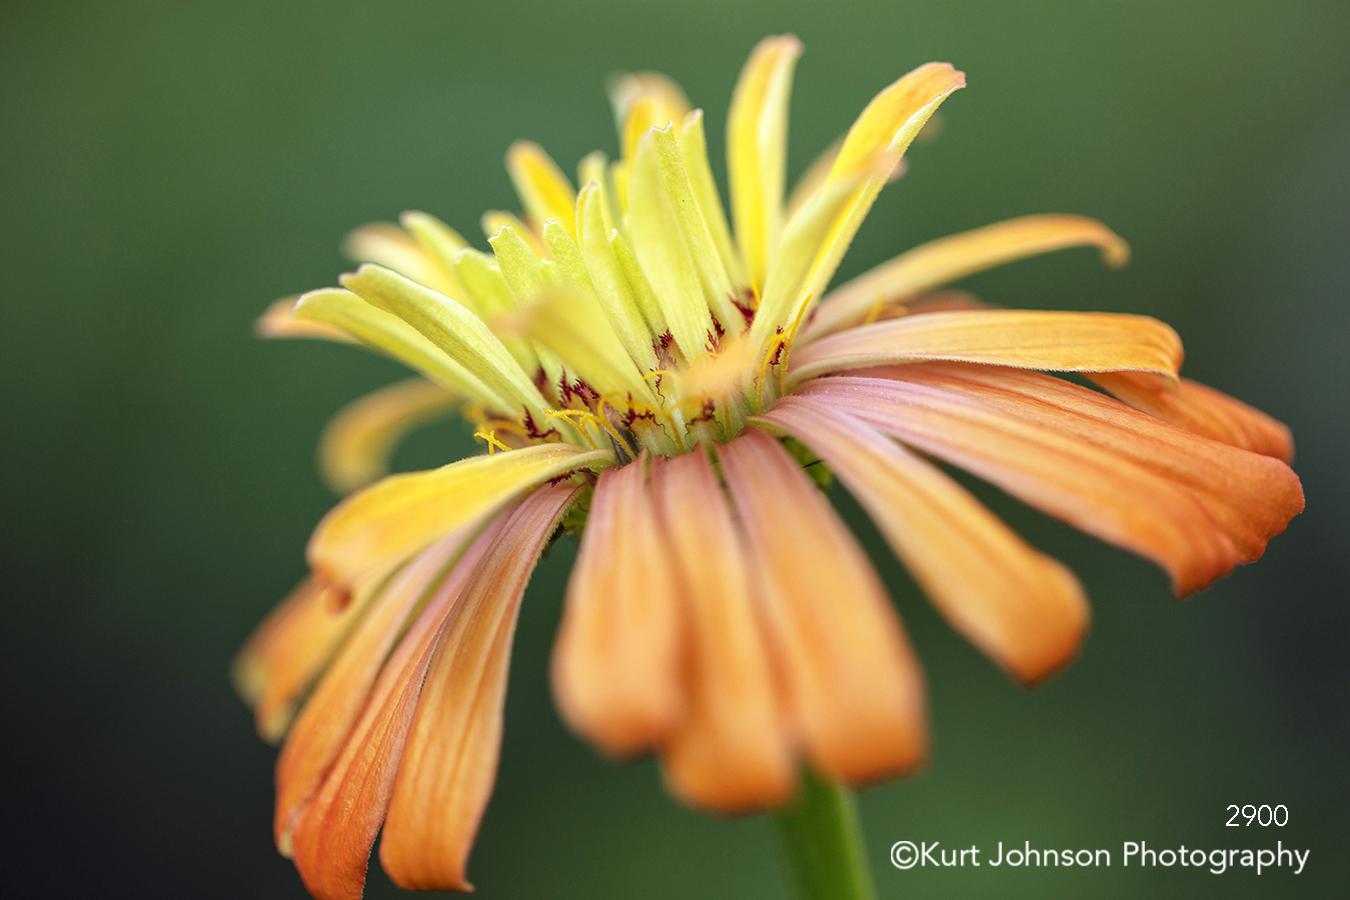 yellow orange flower petal petals close up macro detail contemporary green